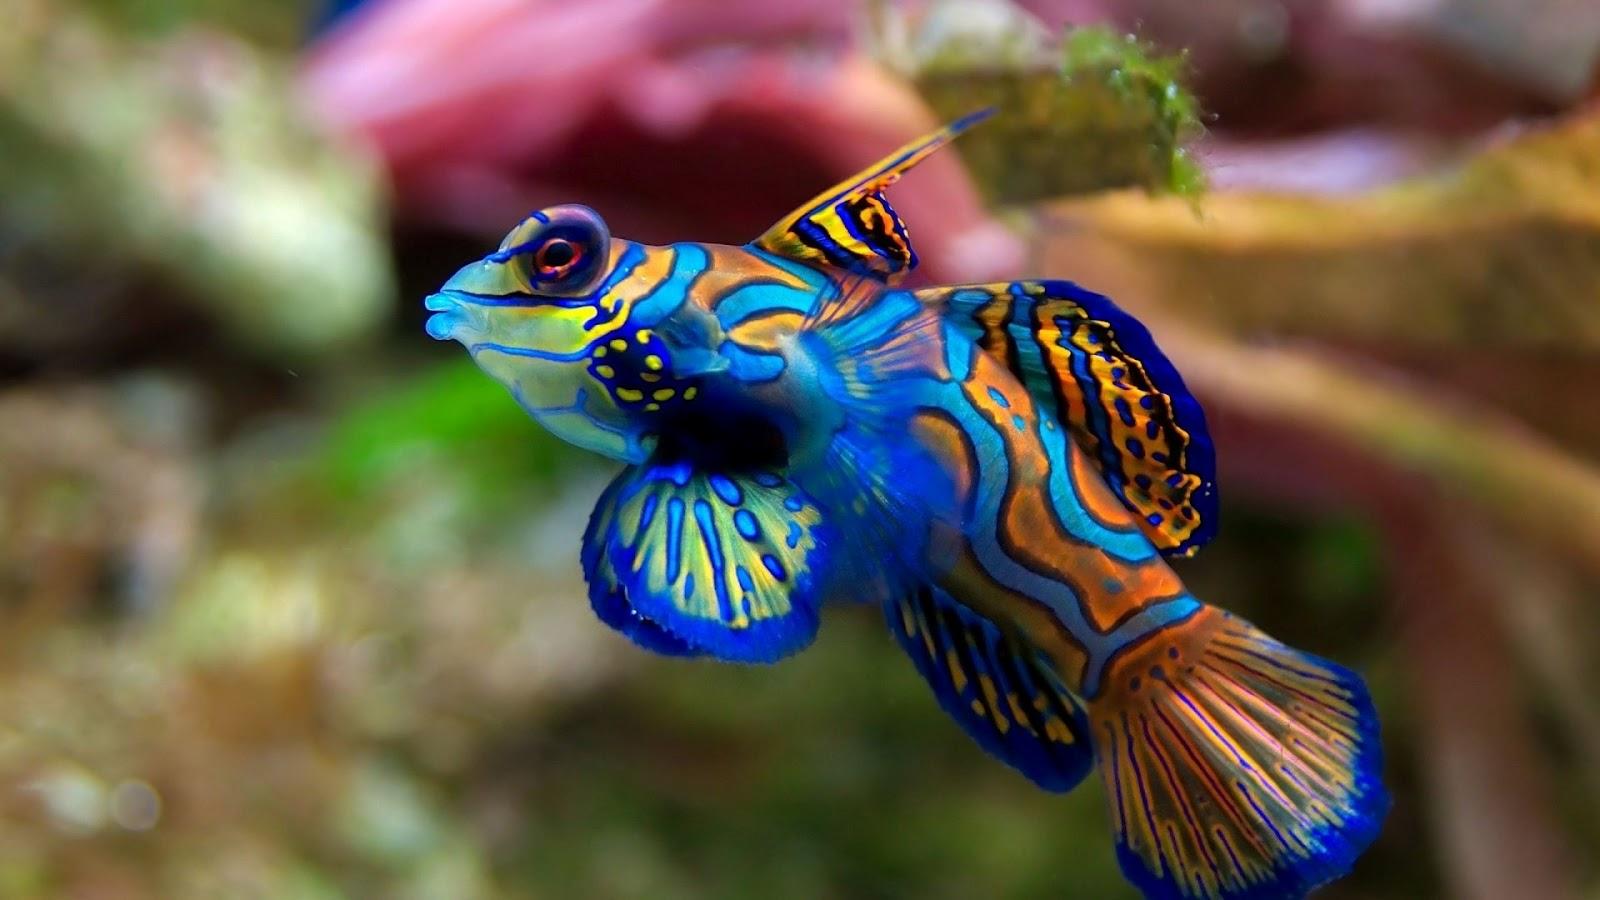 http://4.bp.blogspot.com/-jMXPsDq2RHg/UHLdHK-Jb8I/AAAAAAAAFQ4/76NY9WFJ0AU/s1600/exotic-fish-1080.jpg